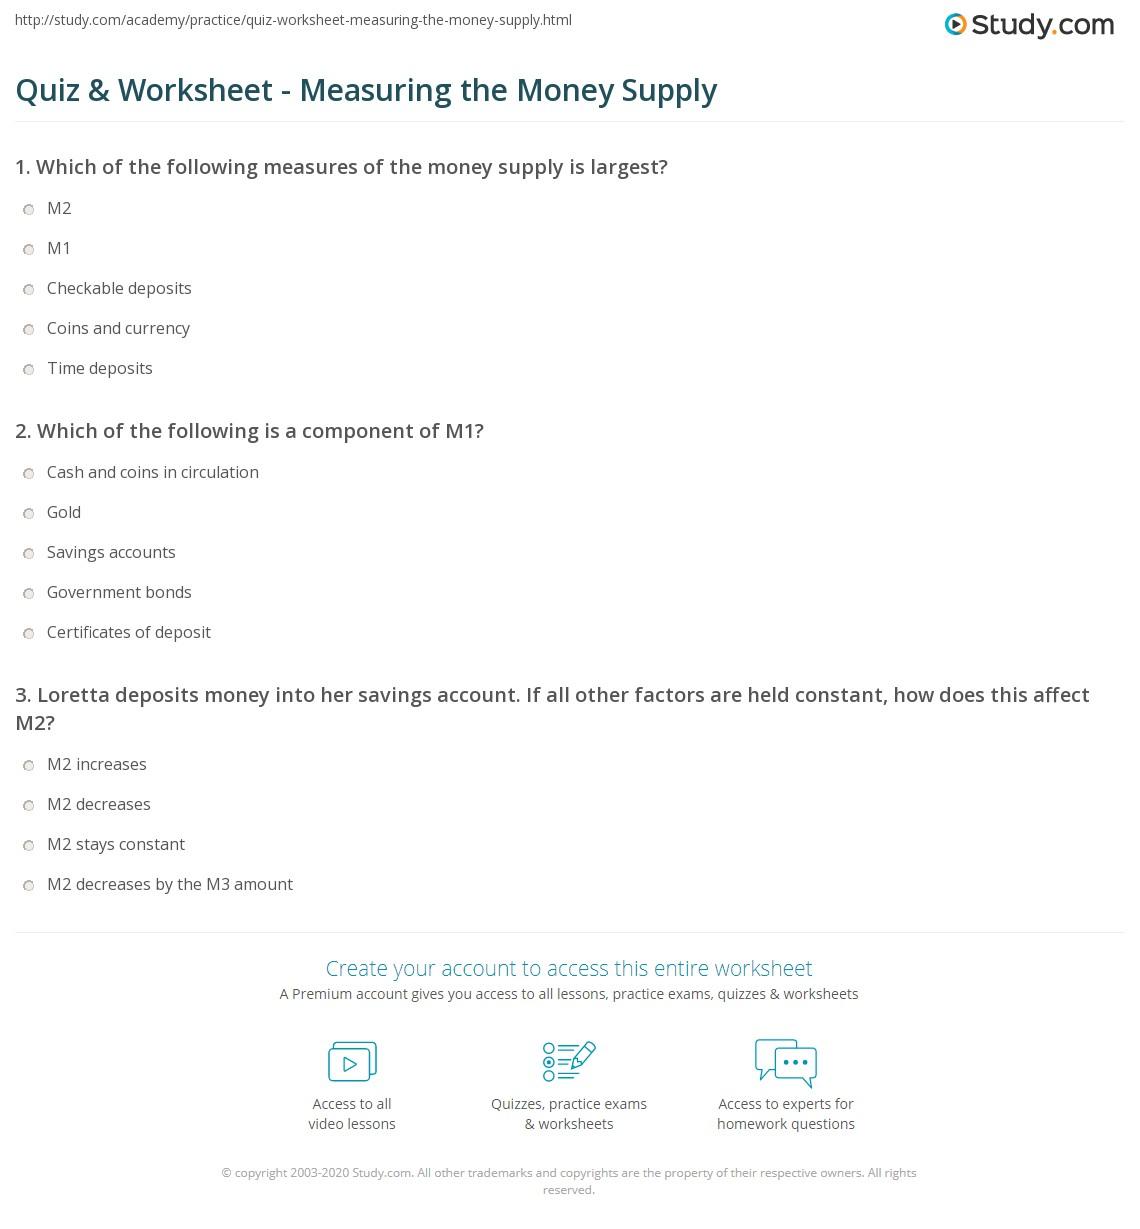 worksheet M1 Worksheets quiz worksheet measuring the money supply study com print explanation and examples worksheet